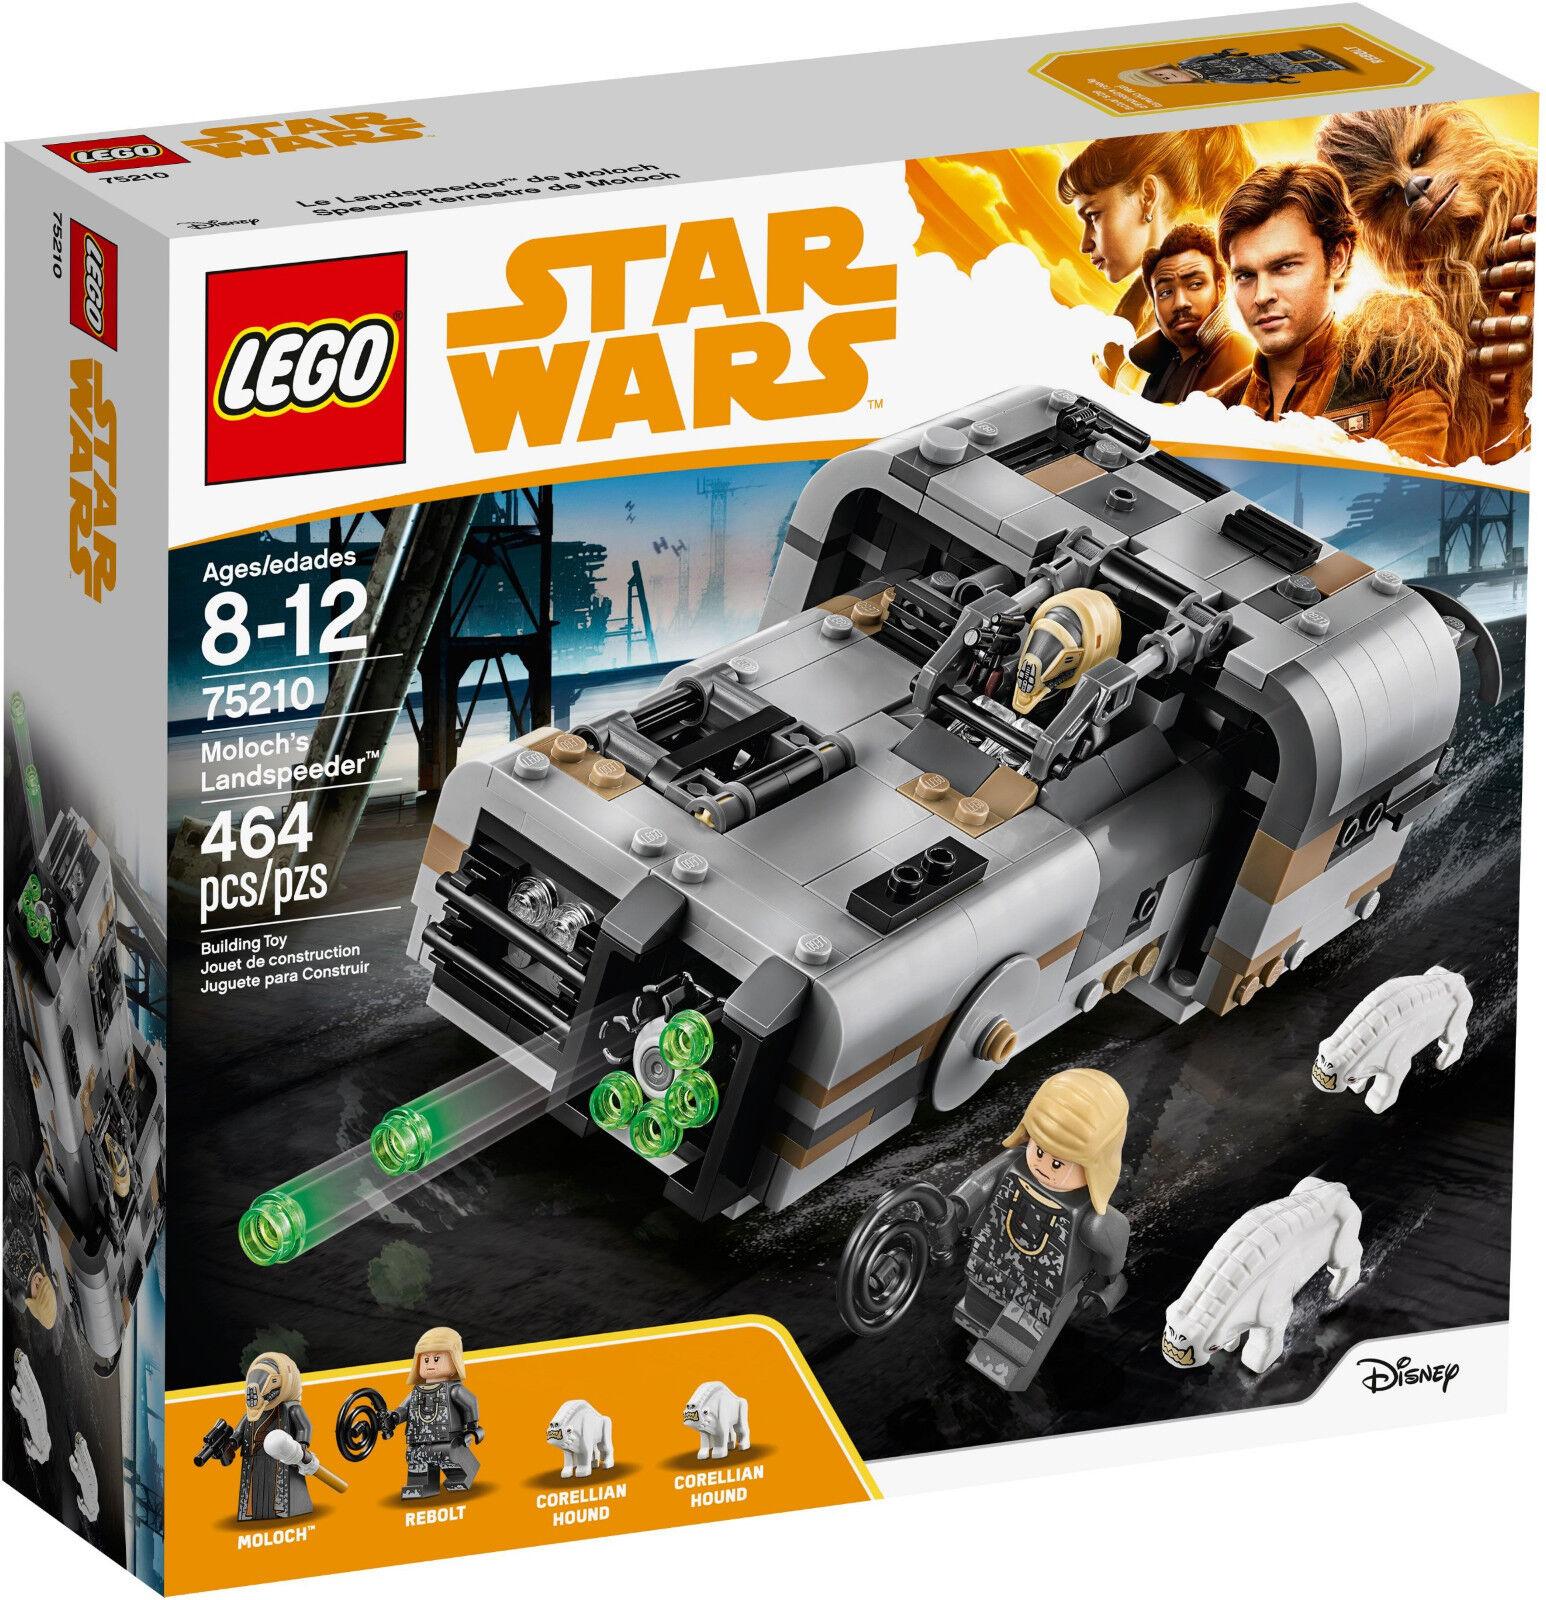 Lego Star Wars - 75210 Moloch's Landspeeder avec rebolt-NOUVEAU & NEUF dans sa boîte | Apparence Attrayante